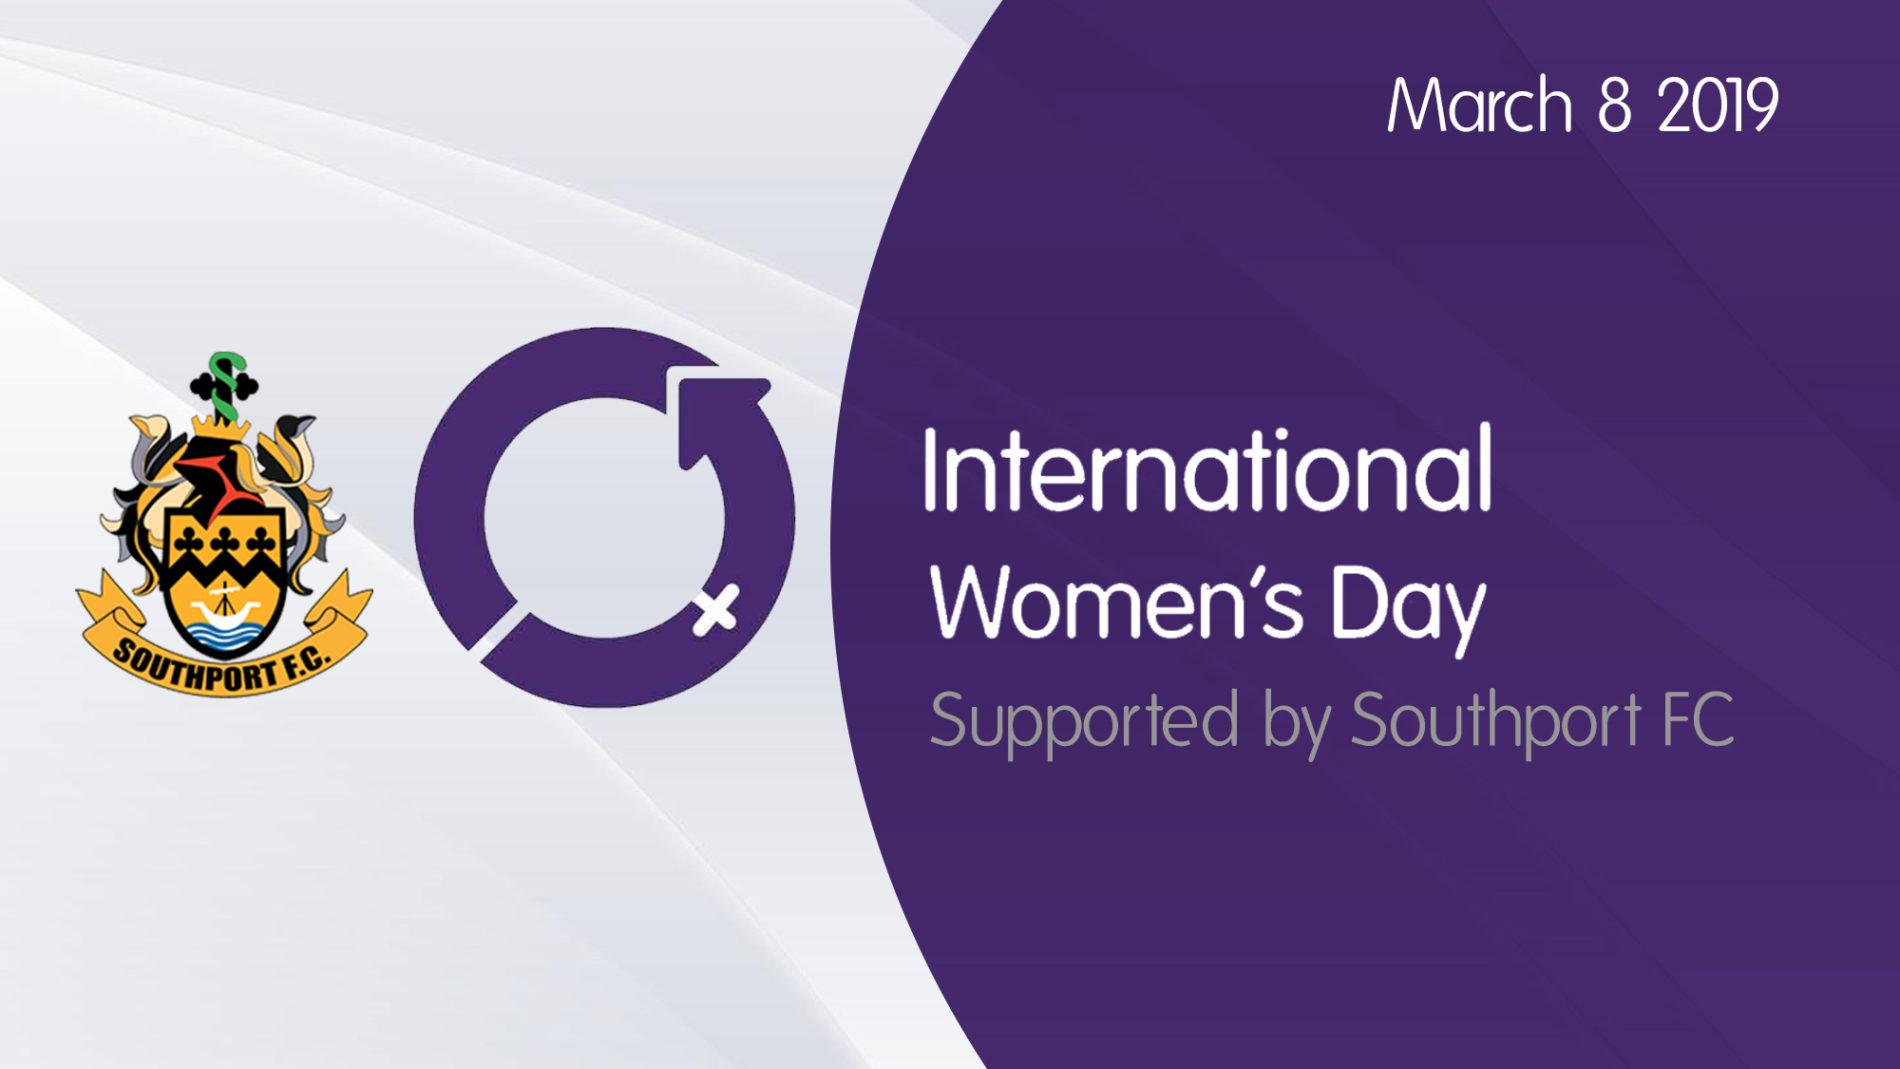 SUPPORT | International Women's Day